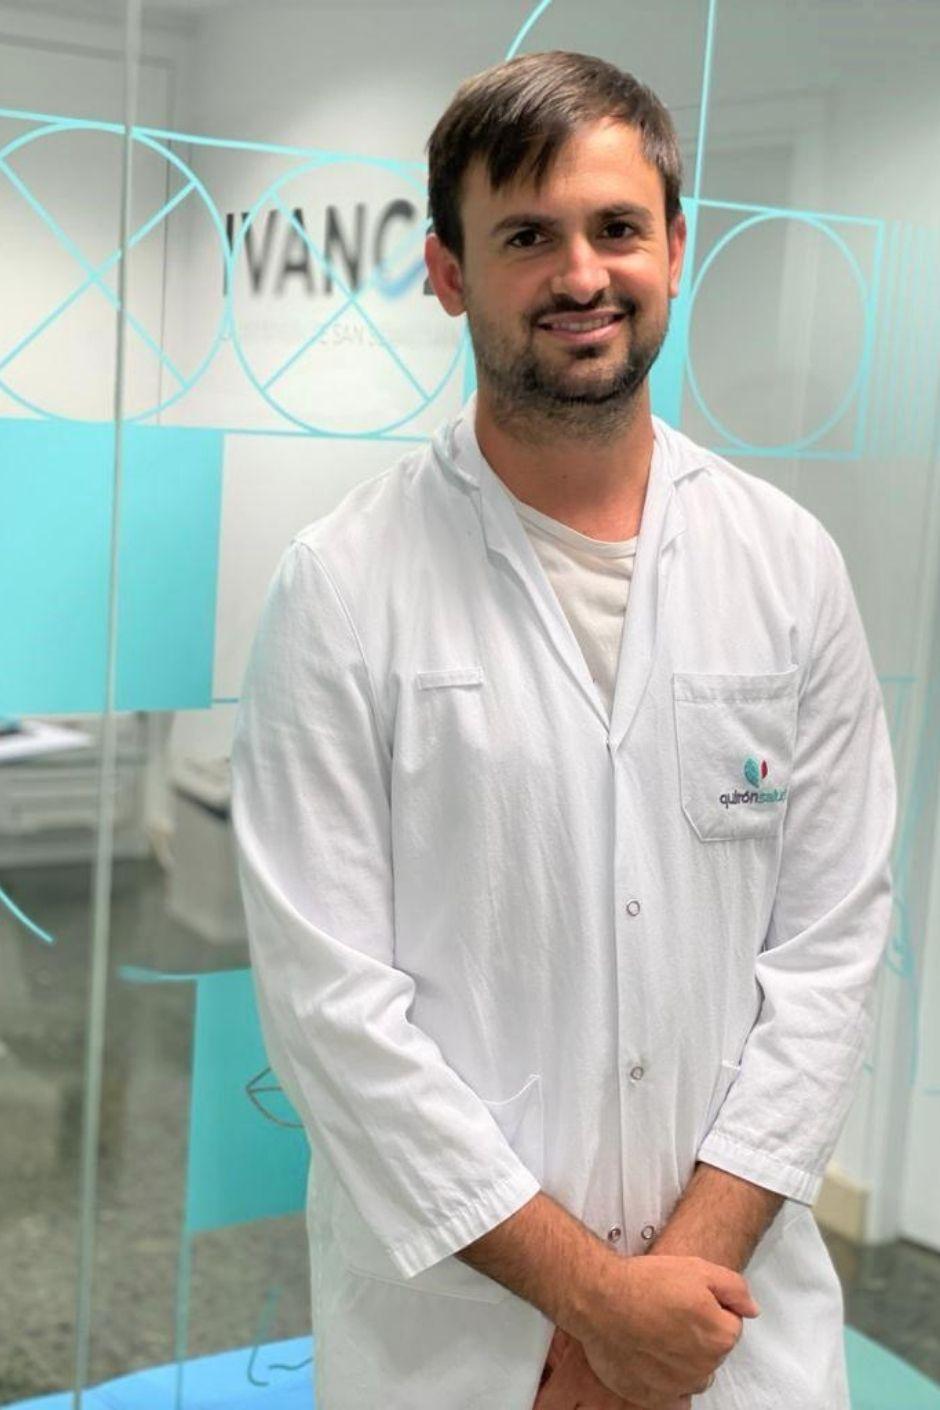 Jon Mikel Castillo IVANCE Cirugía estética en Donostia